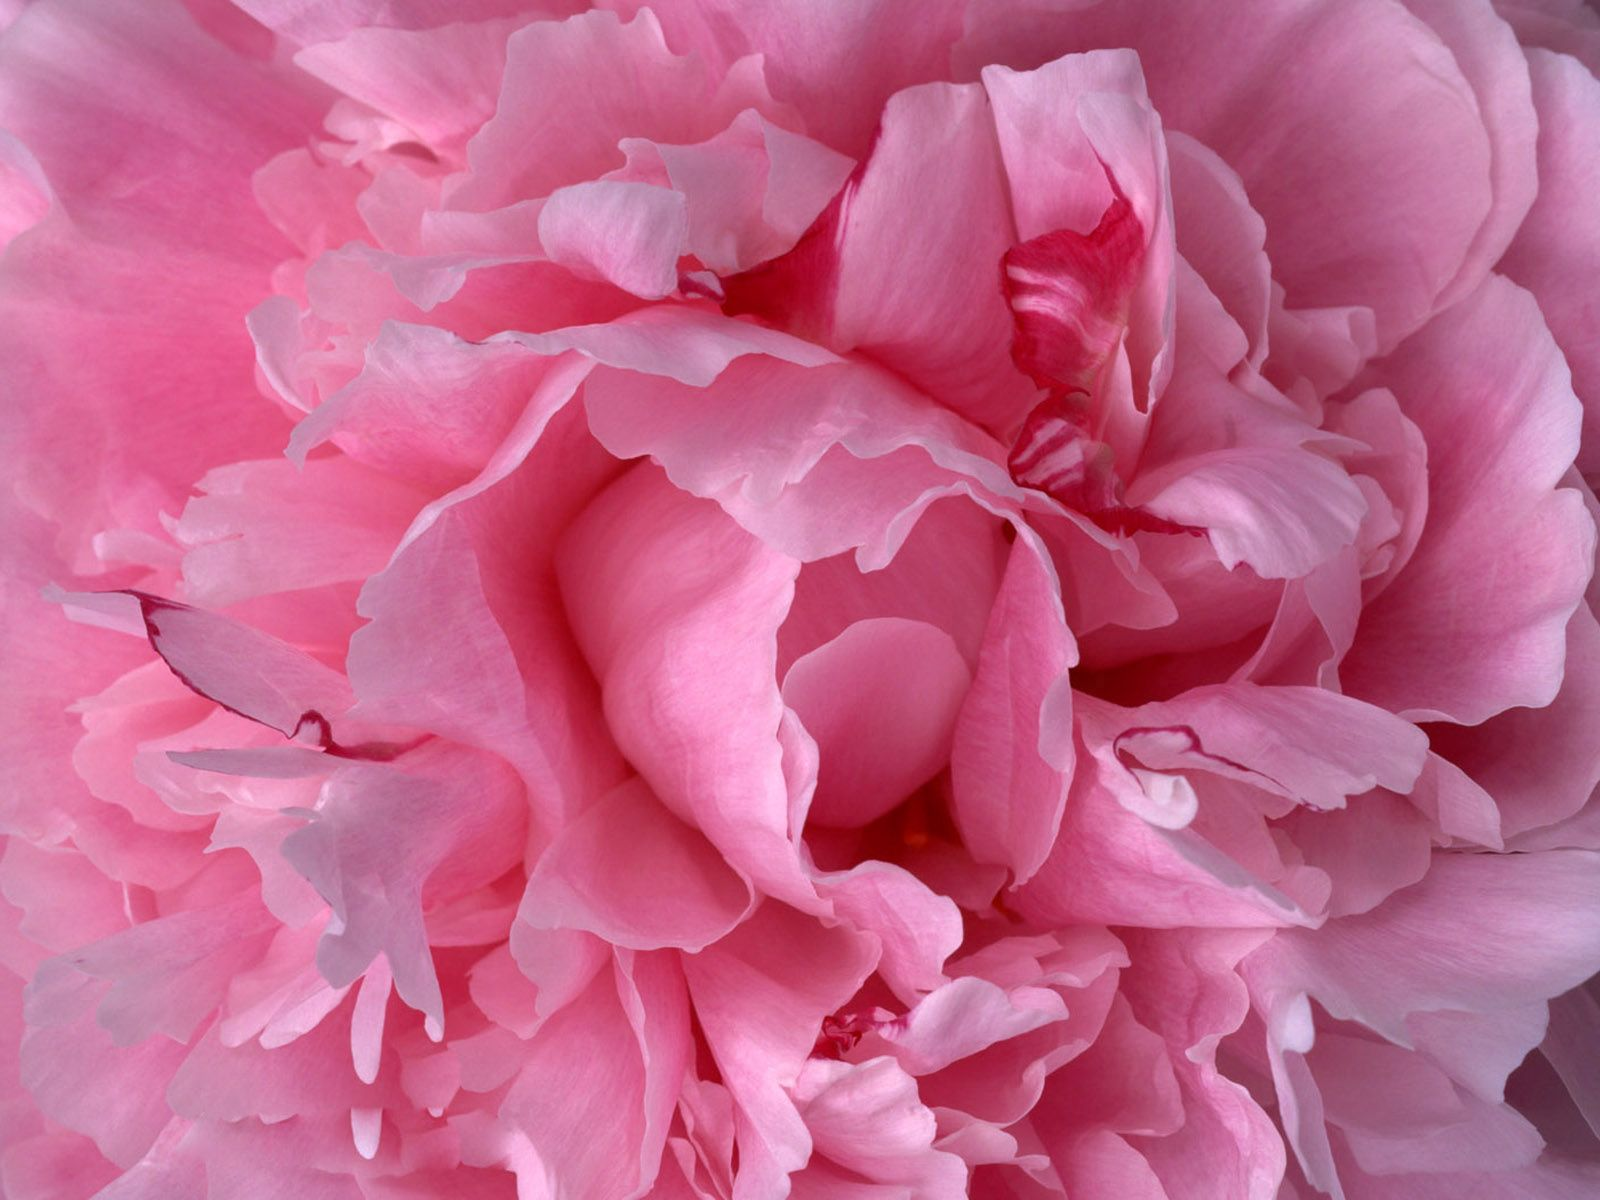 розы фуксия фото